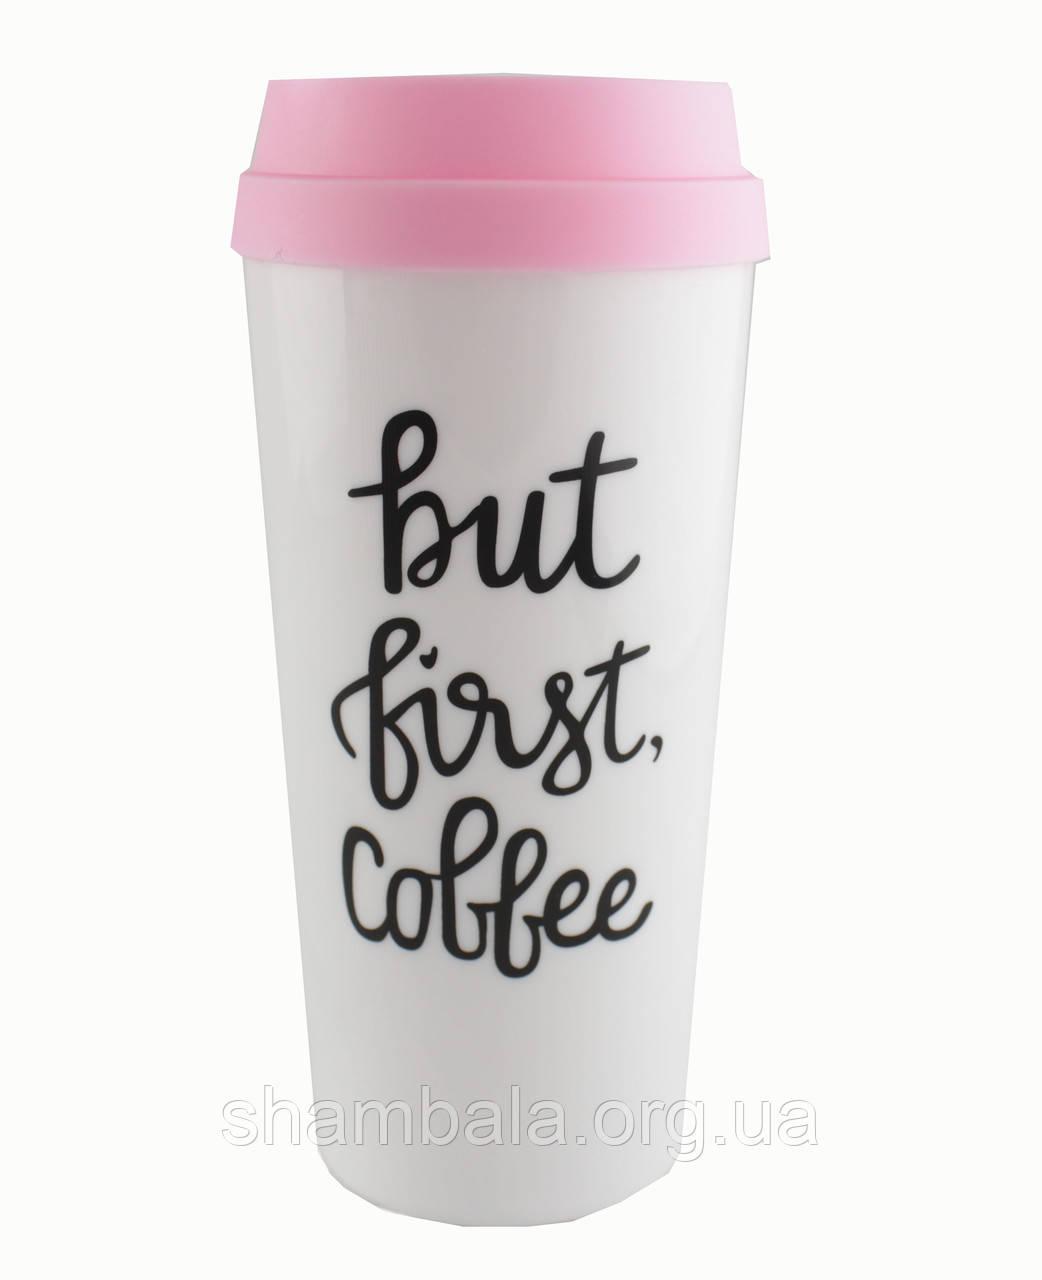 Термостакан для напитков But first coffe (084848)